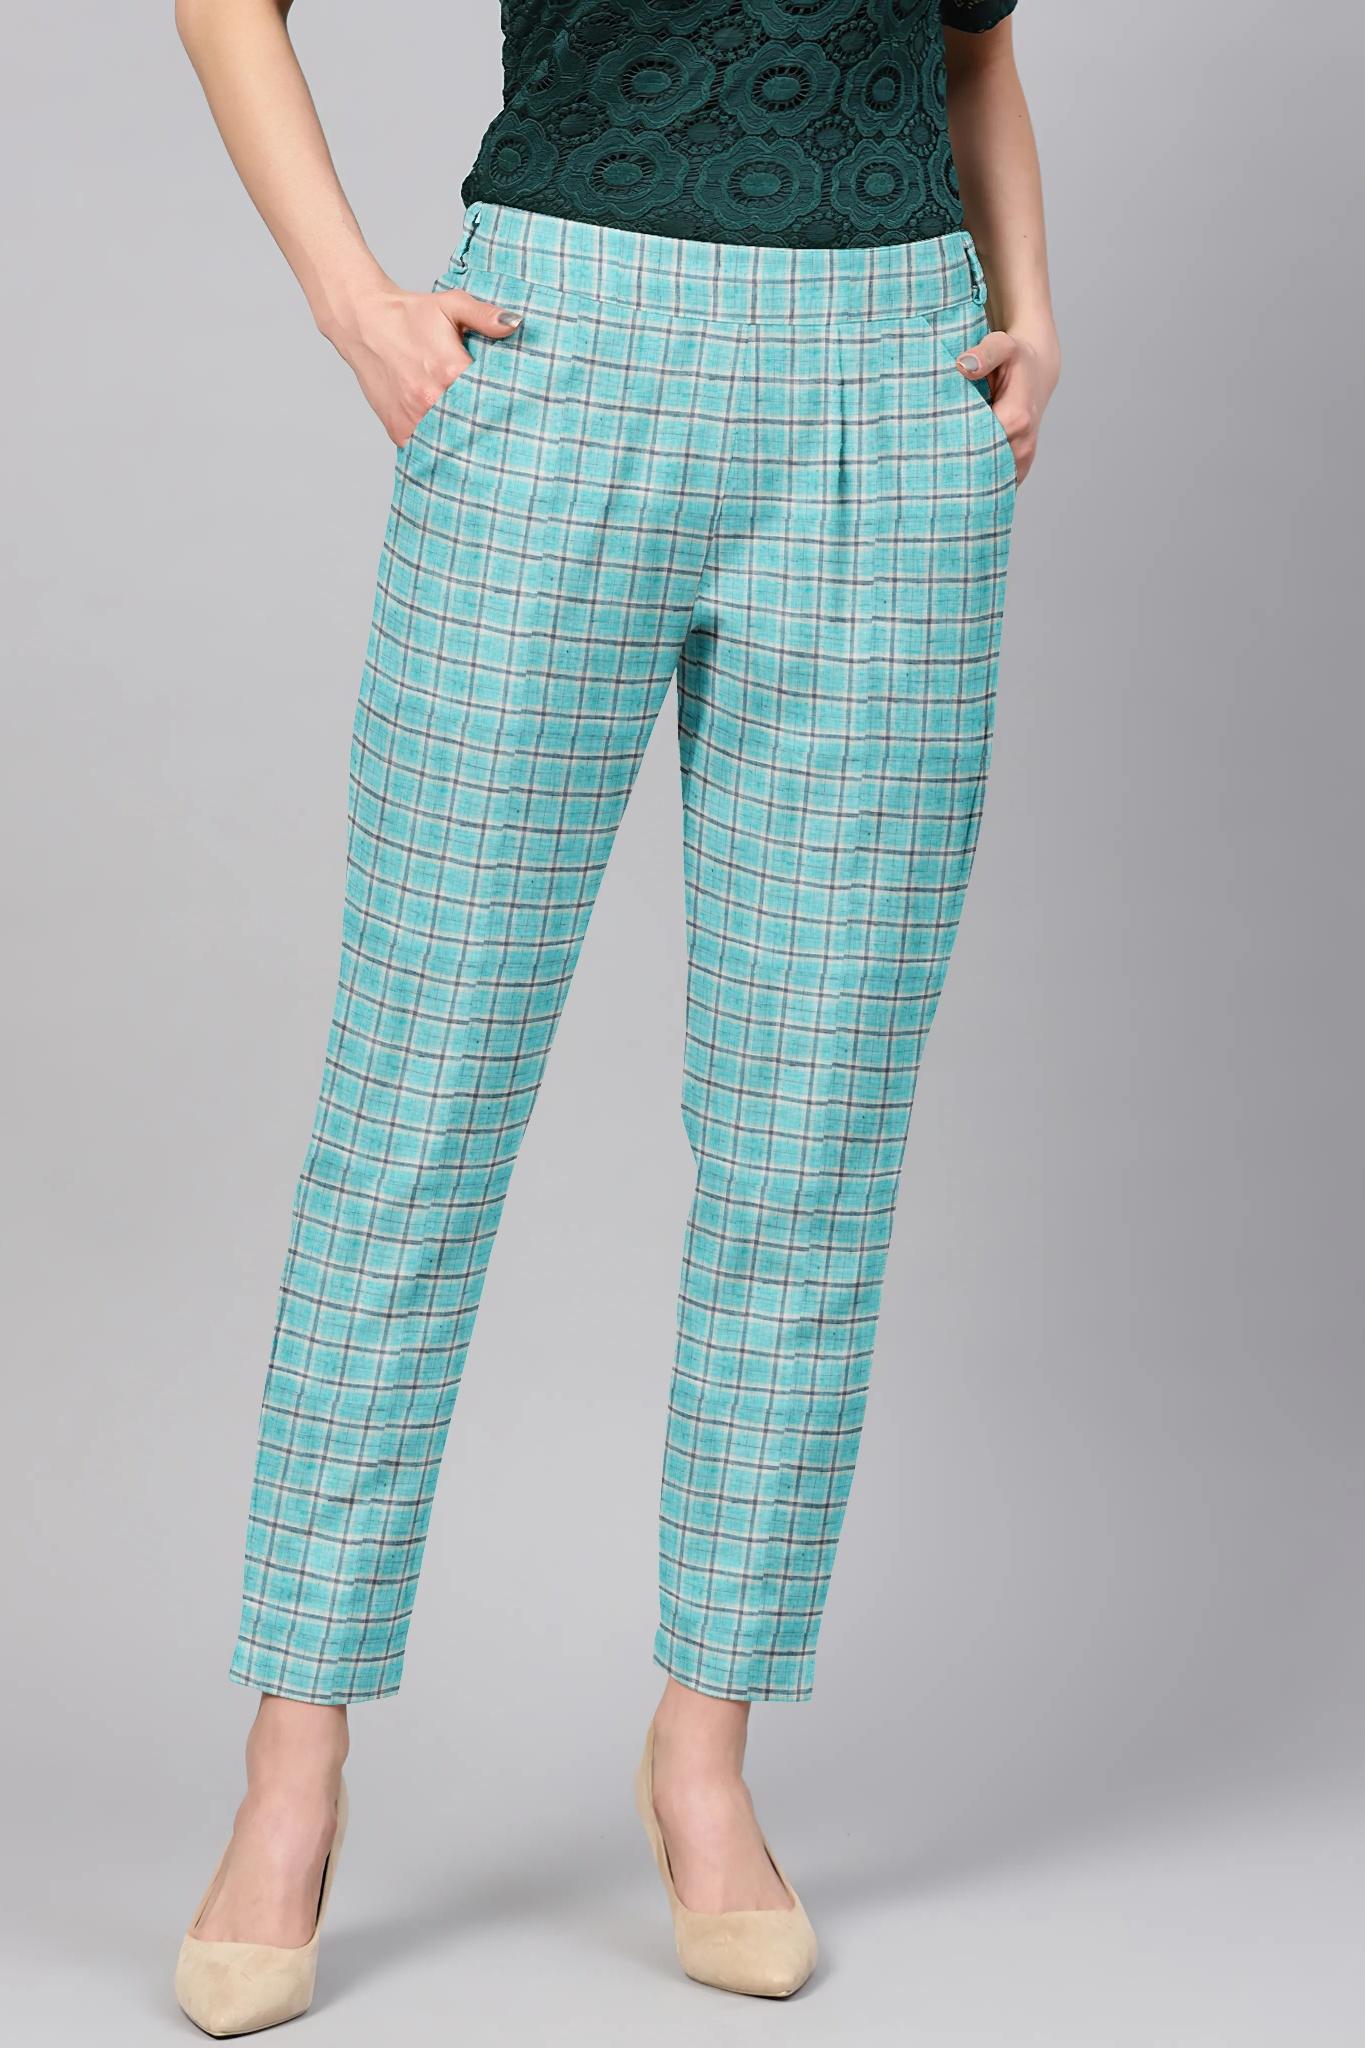 /home/customer/www/fabartcraft.com/public_html/uploadshttps://www.shopolics.com/uploads/images/medium/Sky-Blue-Black-Cotton-Check-Regular-Fit-Solid-Trouser-36080.jpg